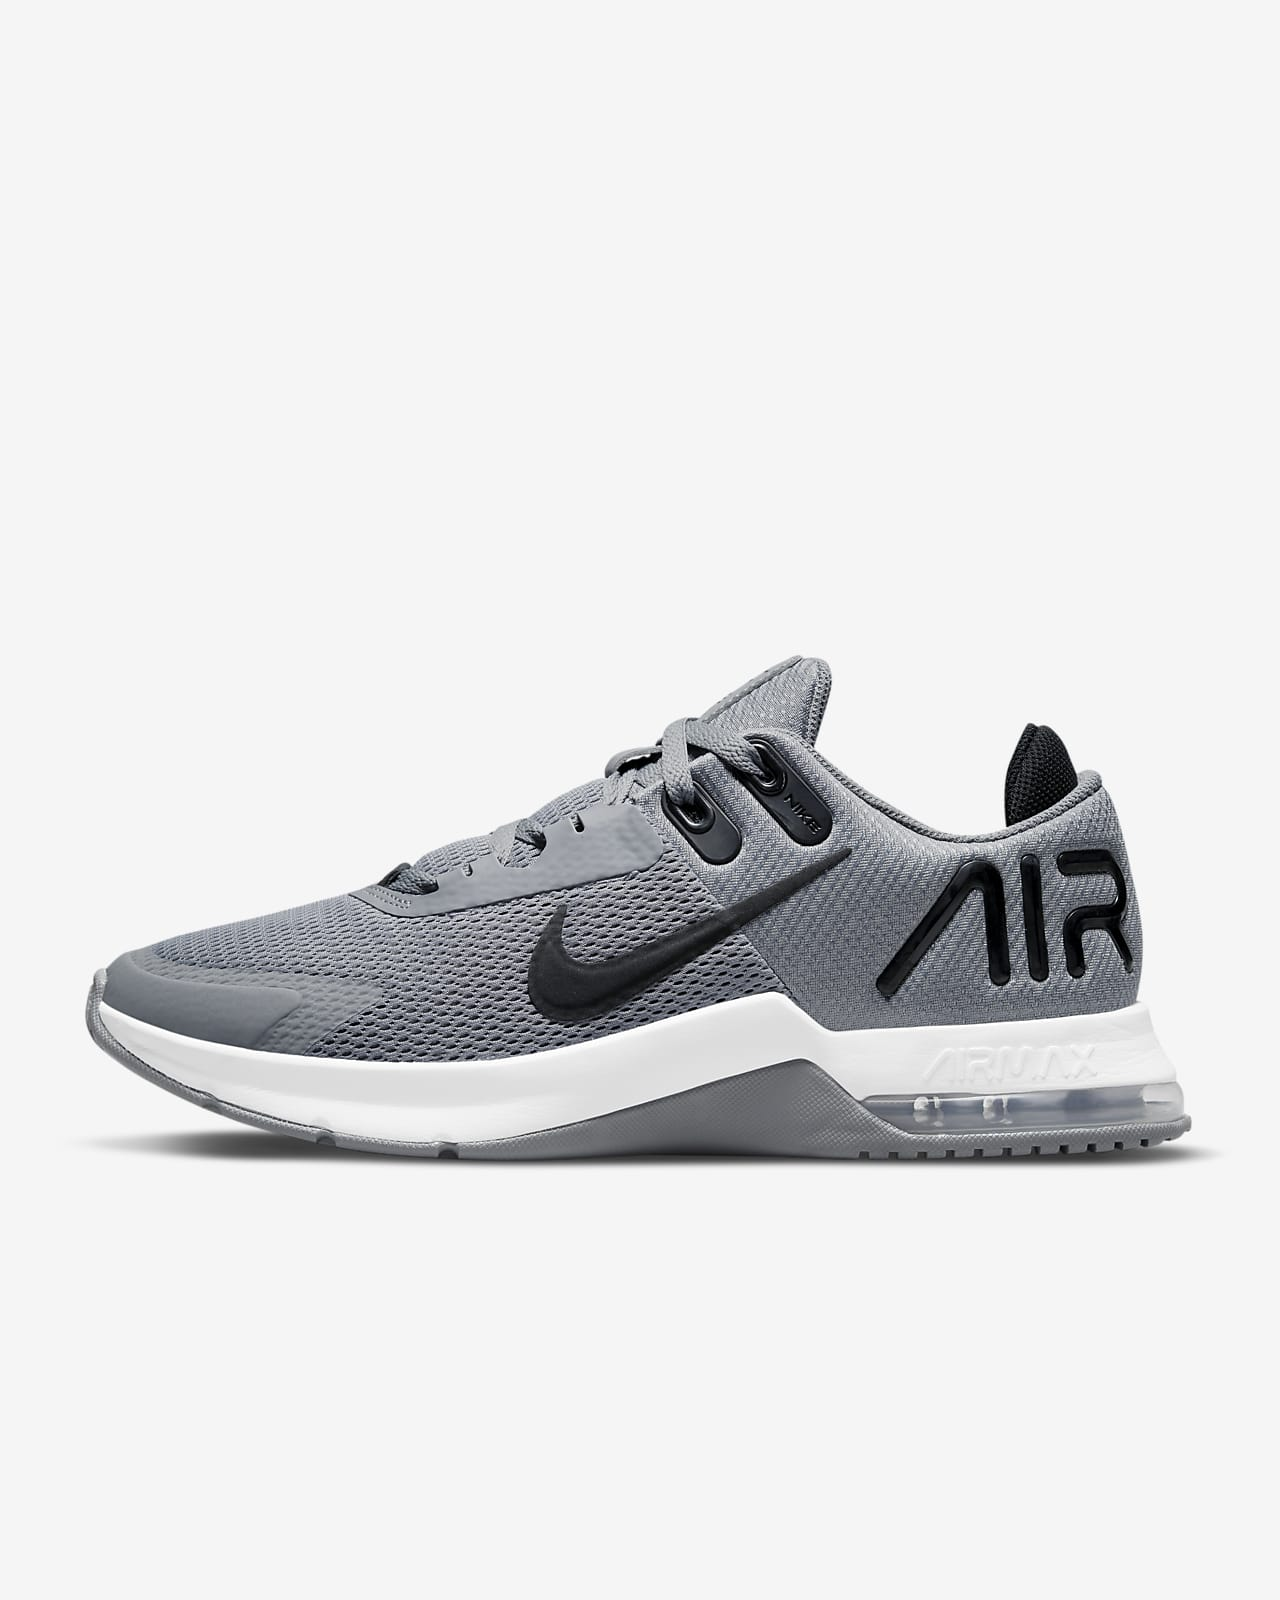 Chaussure de training Nike Air Max Alpha Trainer 4 pour Homme